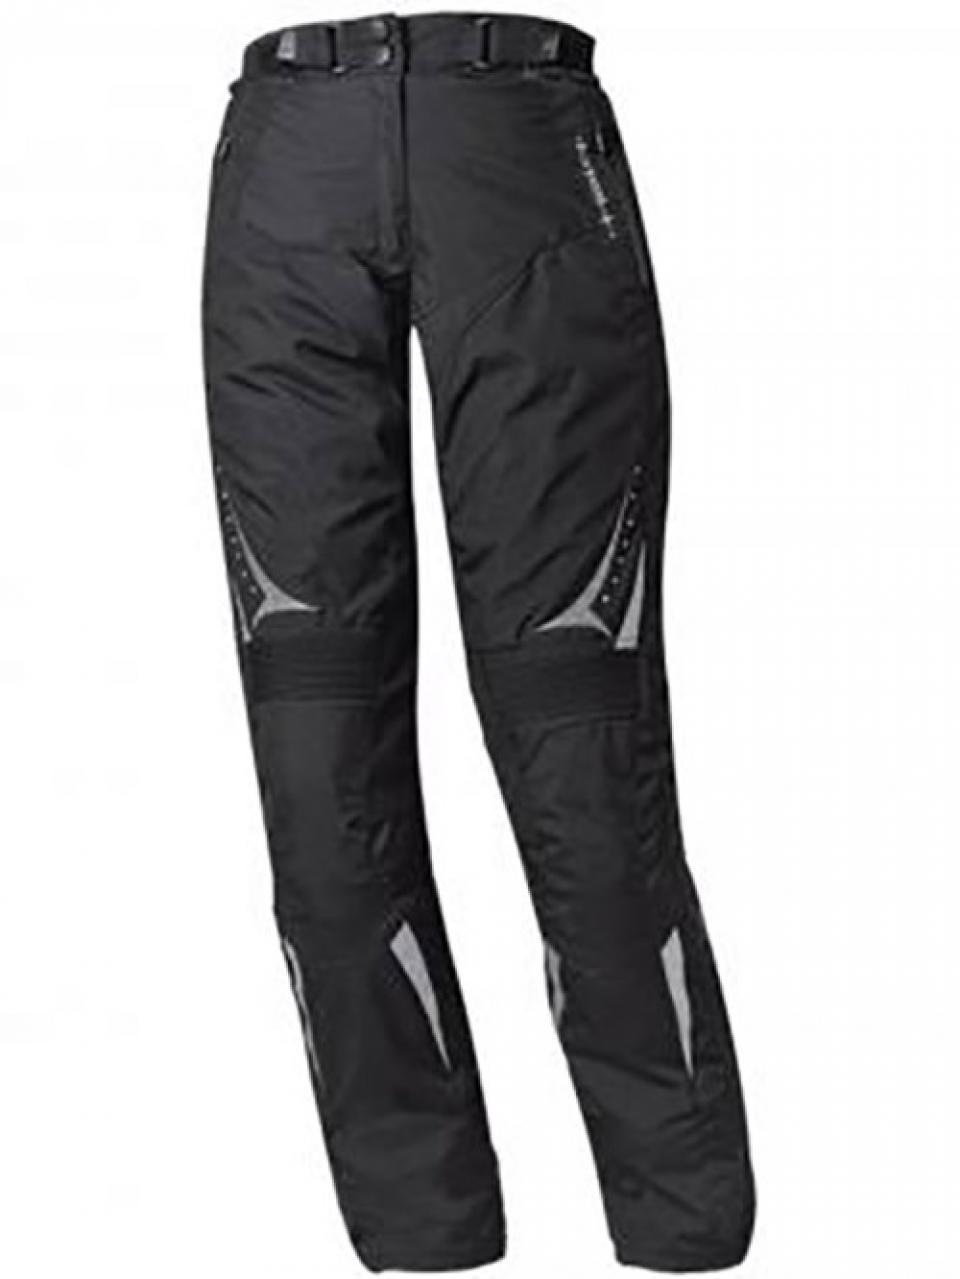 Pantalon moto : en jean, en cuir, il faut choisir